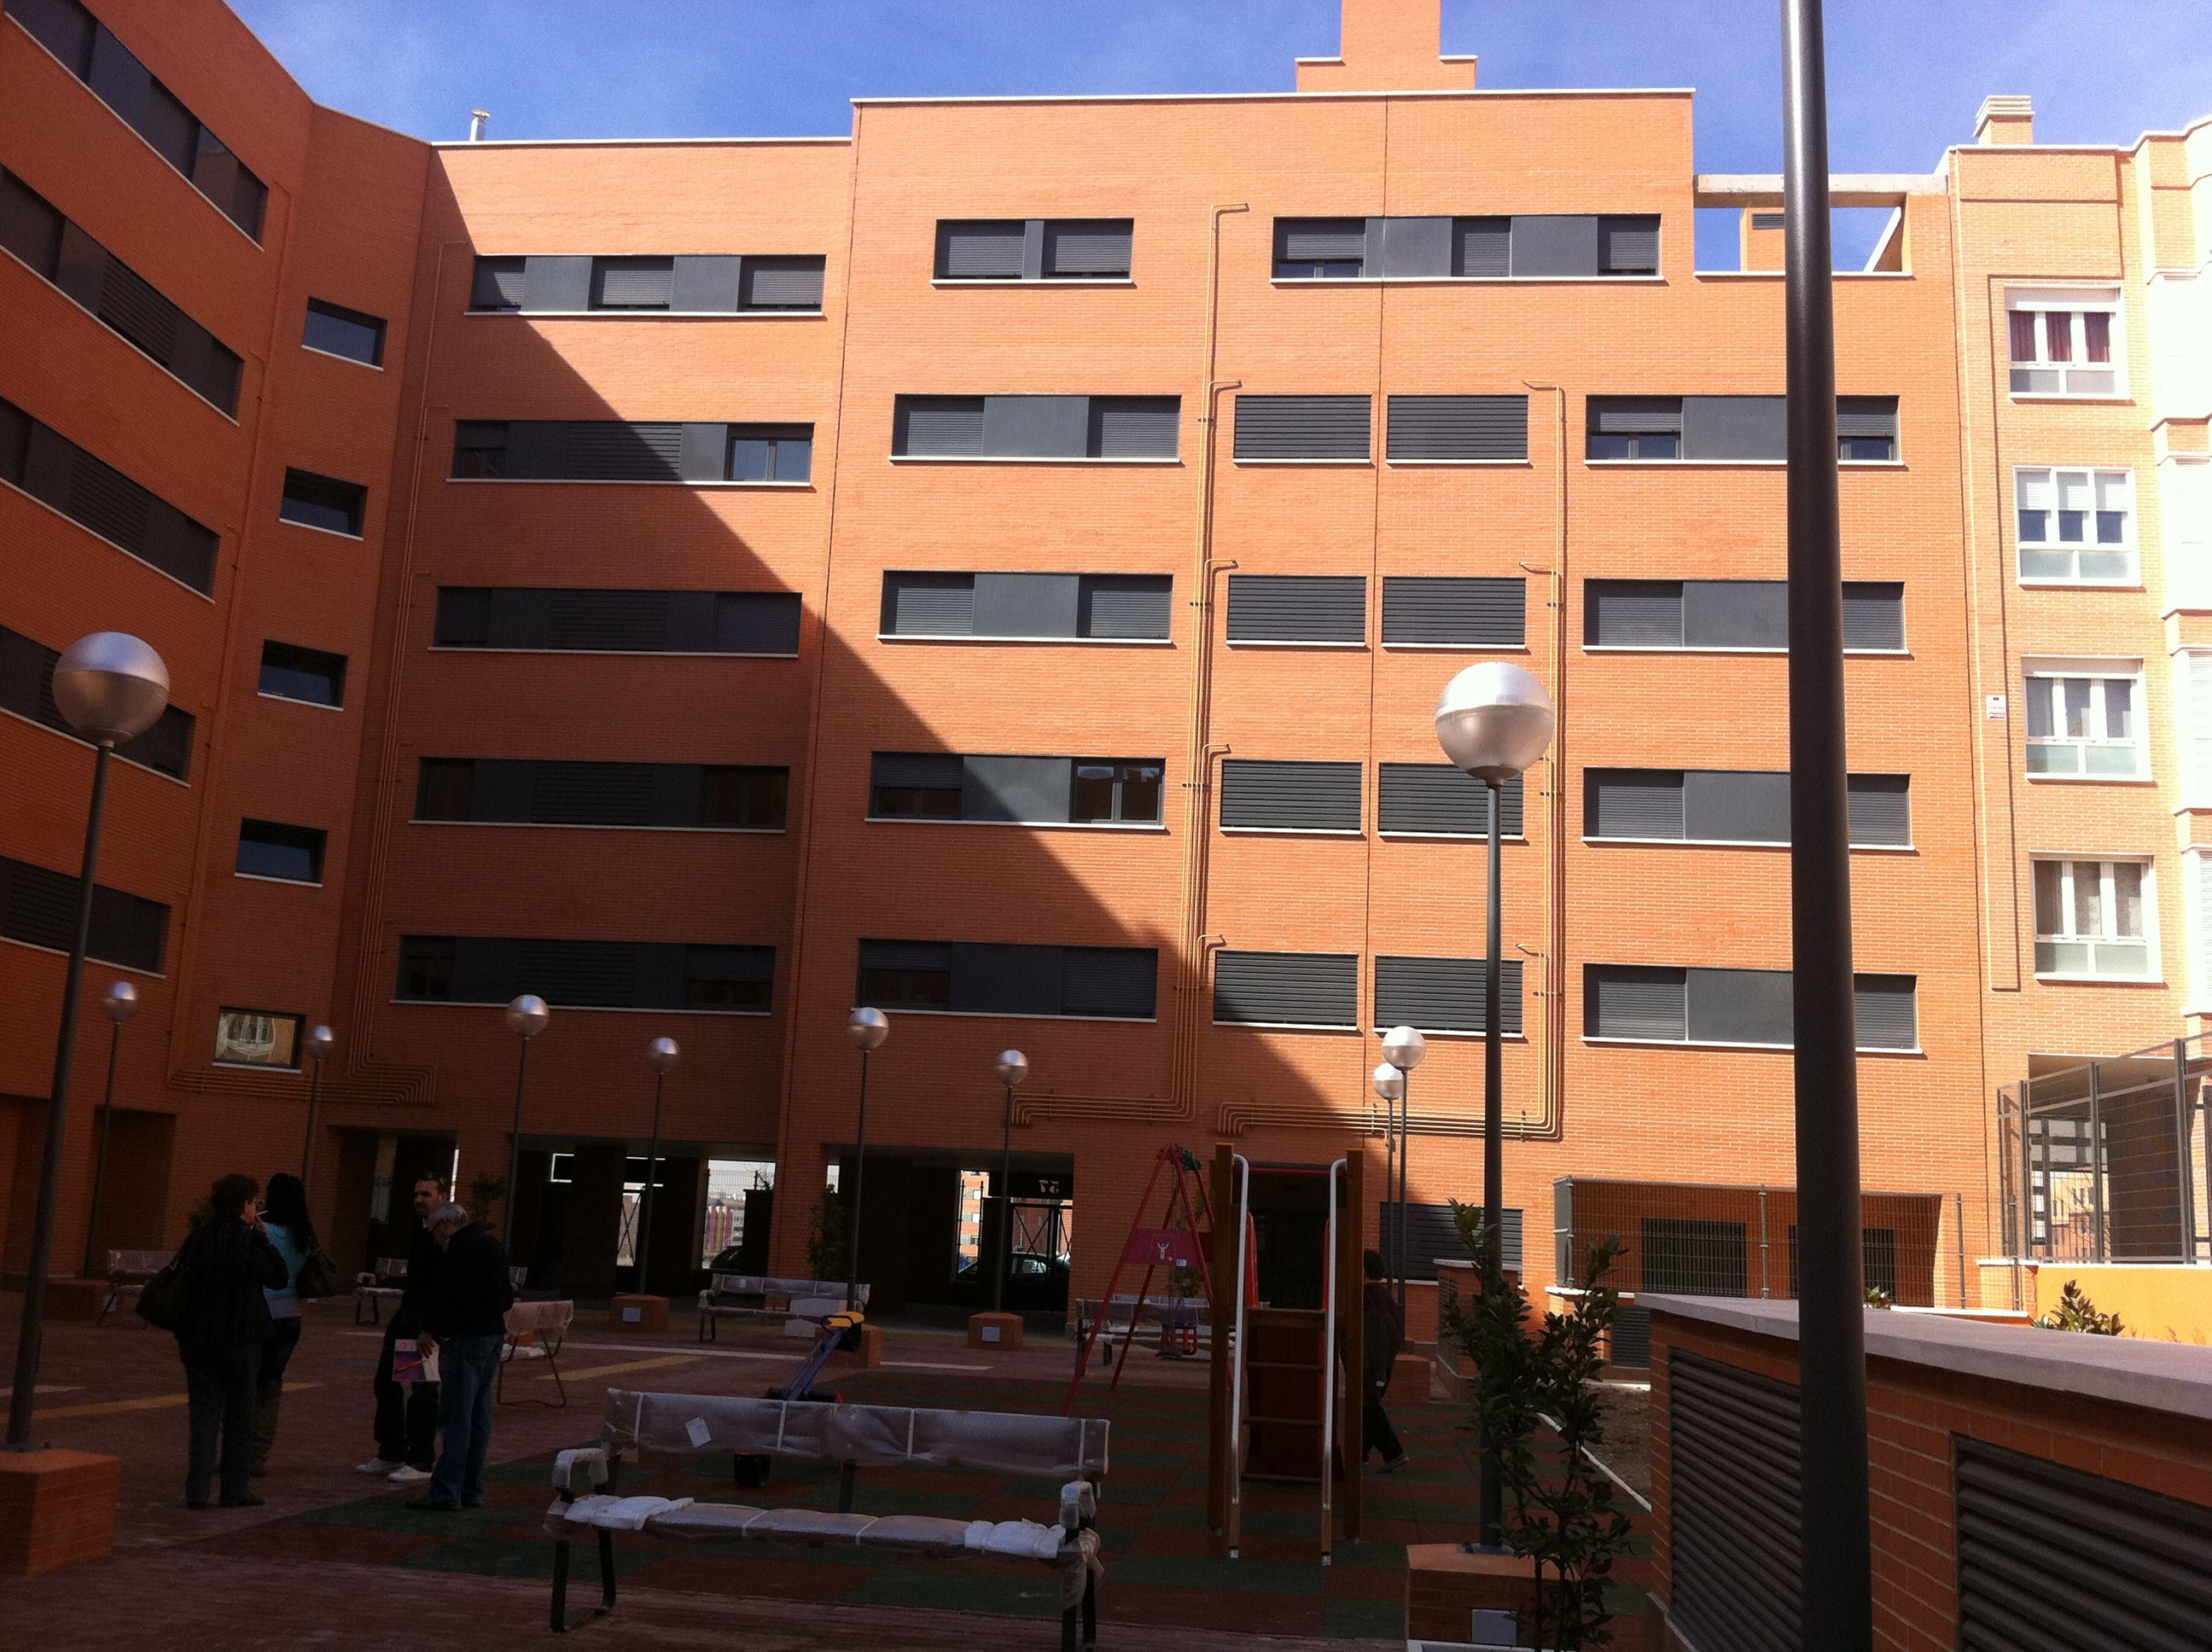 66 viviendas en Vallecas